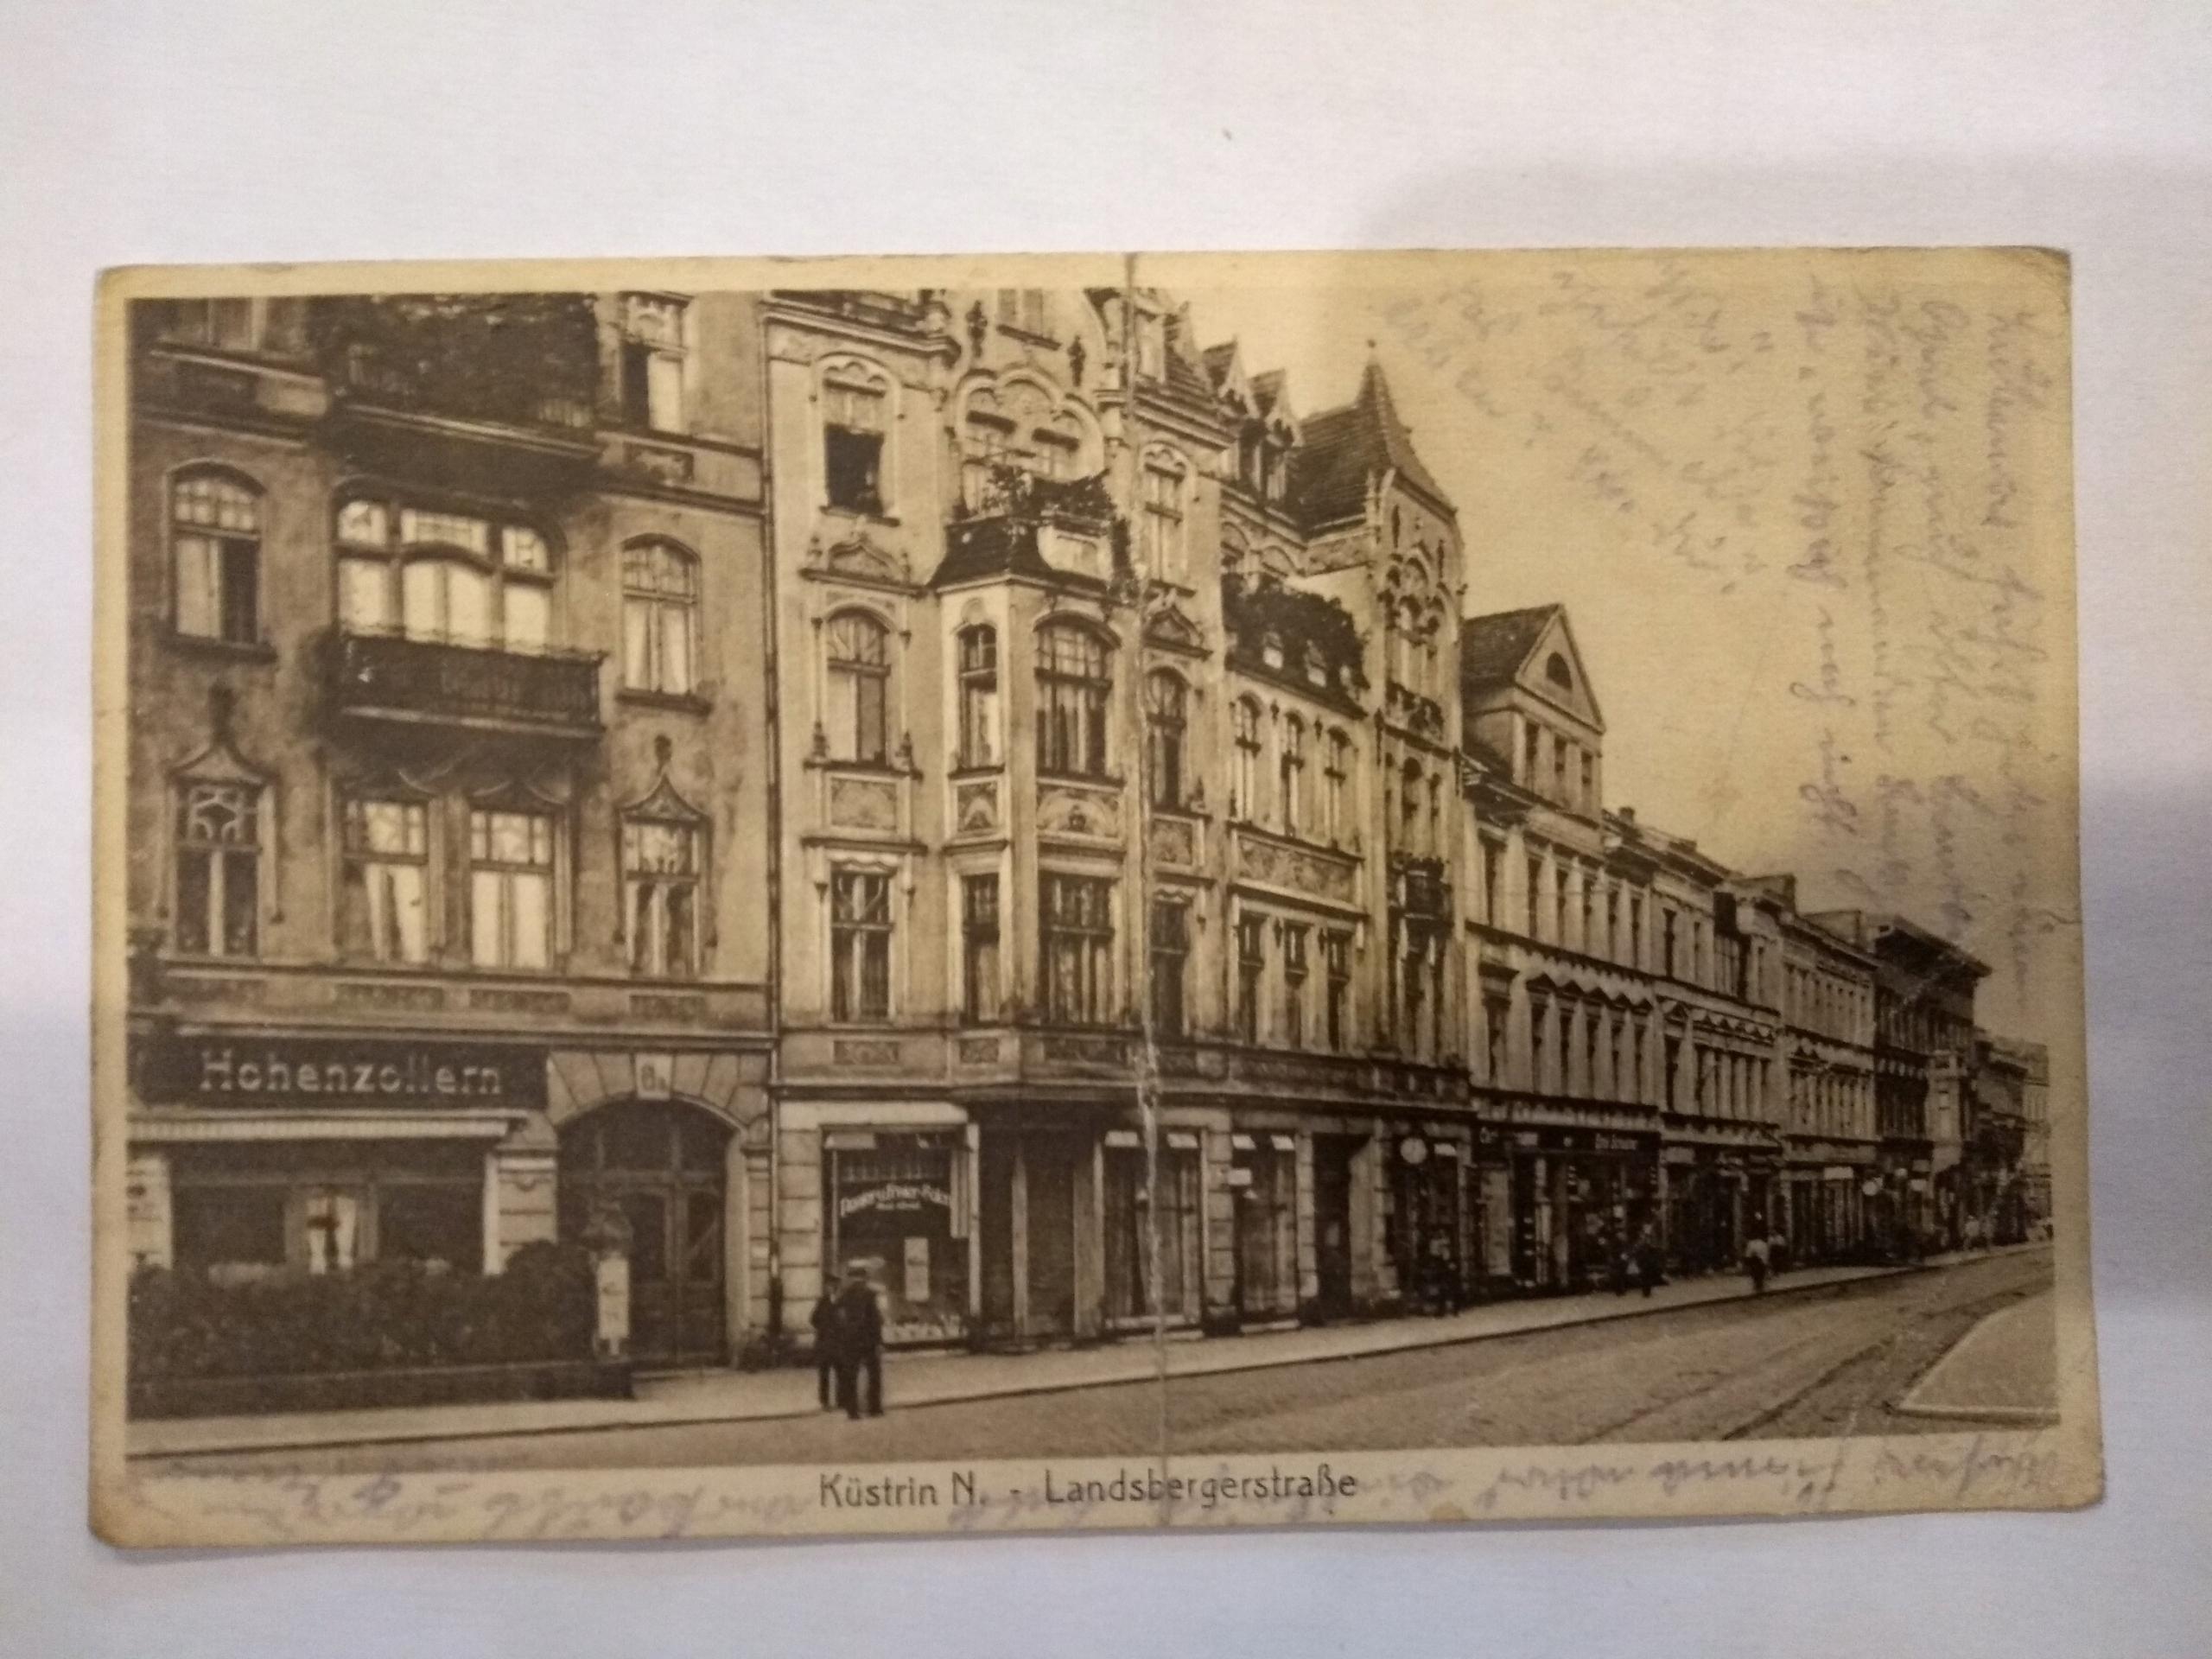 Kostrzyn Kutin Landsbererstrasse pohľadnice